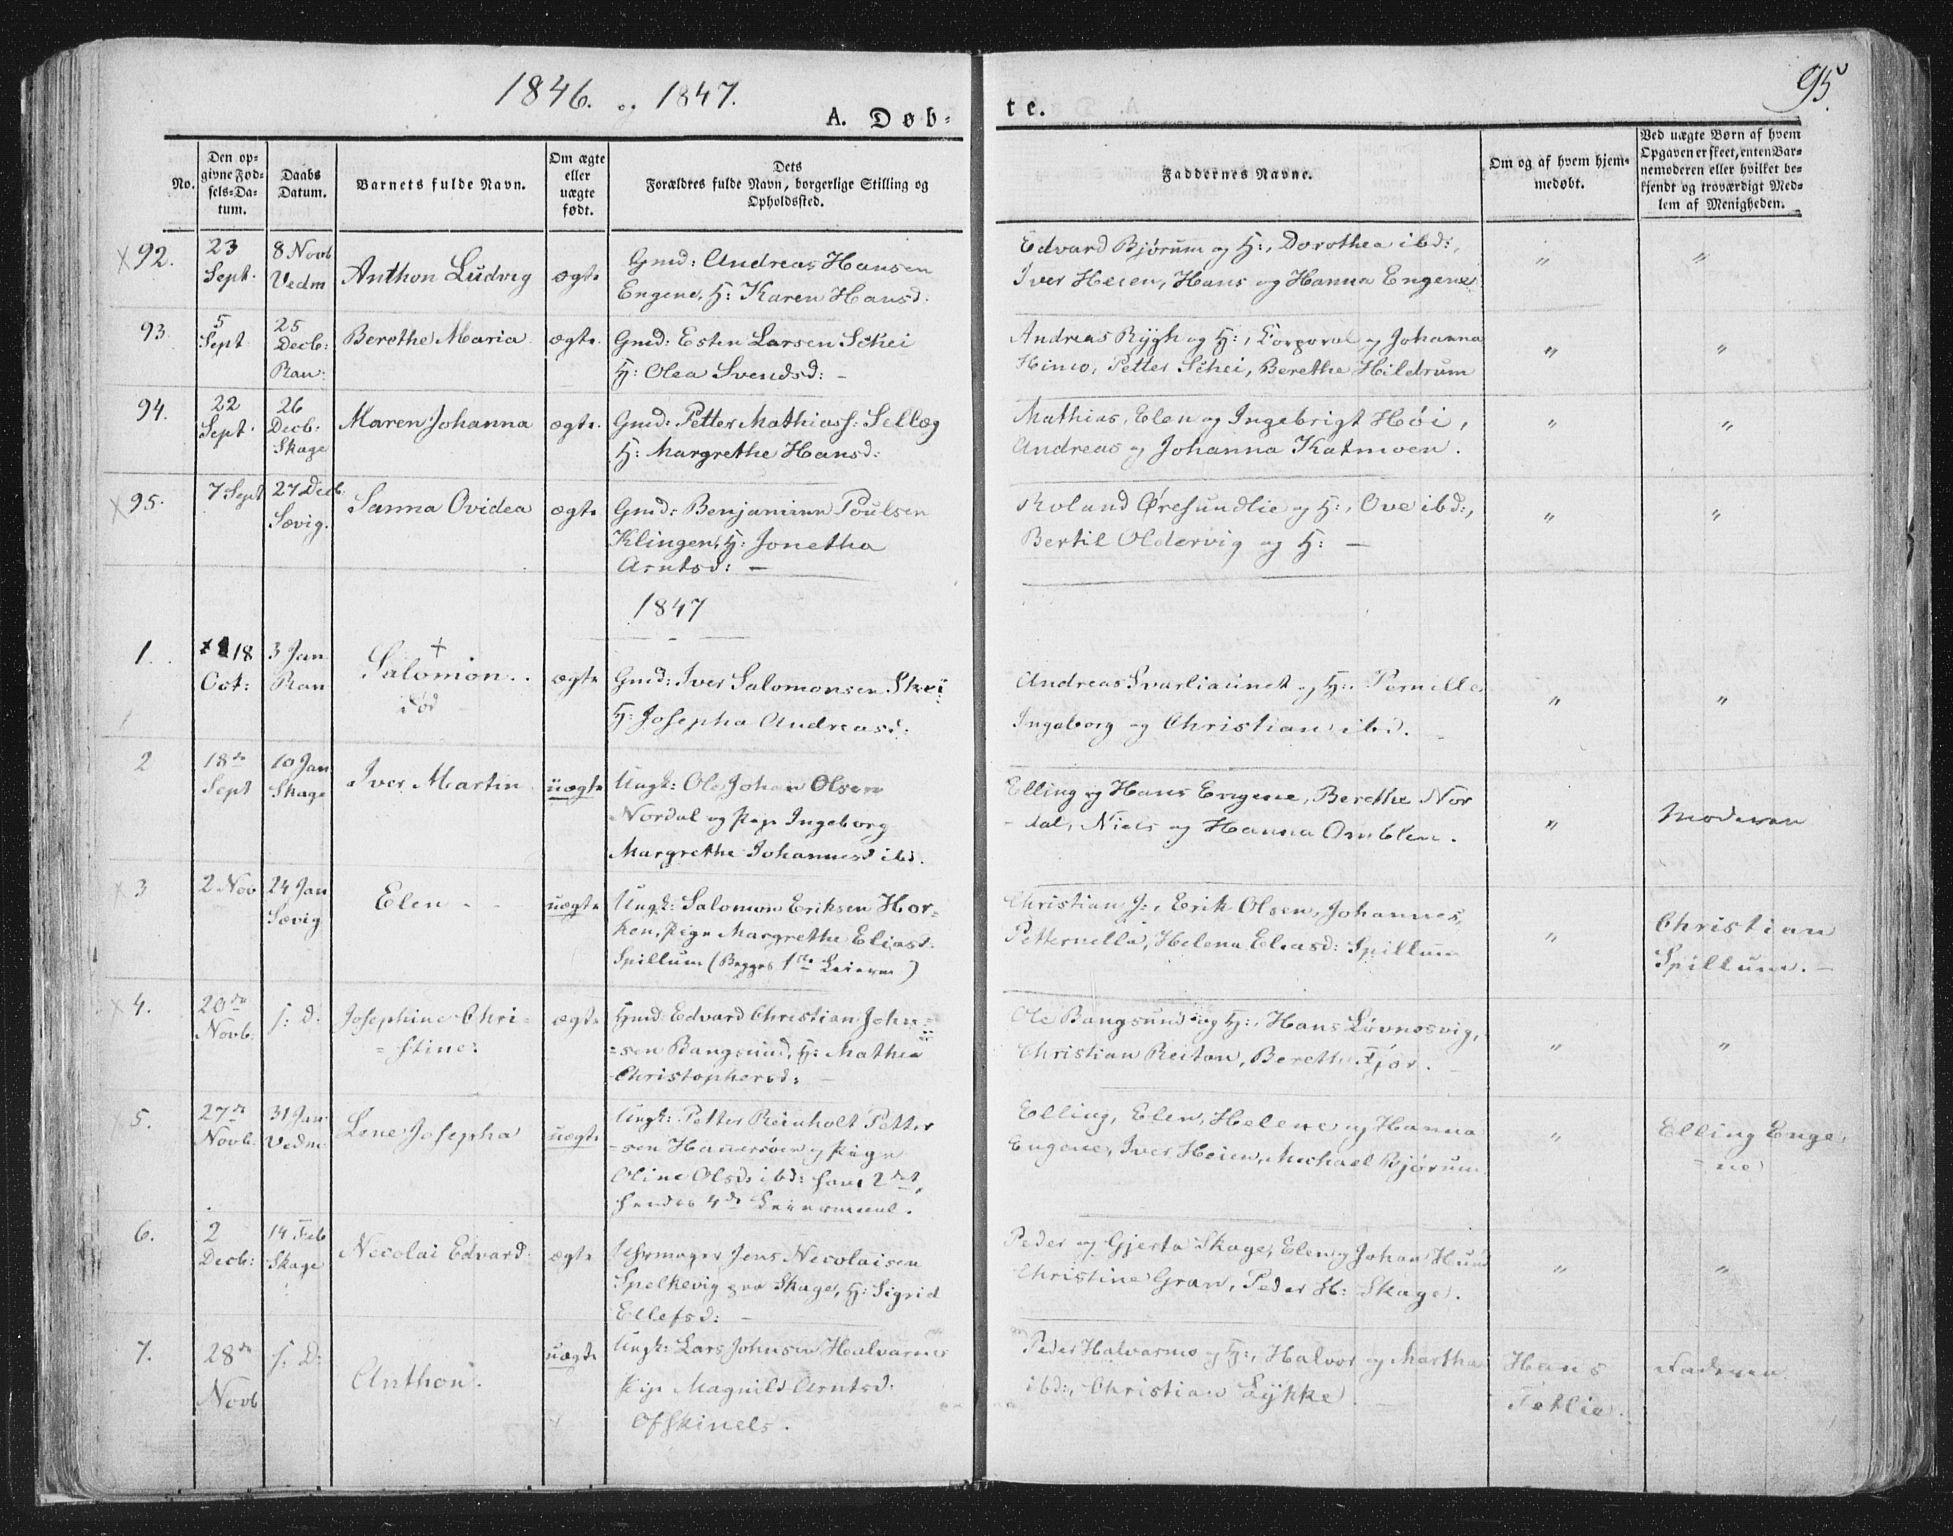 SAT, Ministerialprotokoller, klokkerbøker og fødselsregistre - Nord-Trøndelag, 764/L0551: Ministerialbok nr. 764A07a, 1824-1864, s. 95